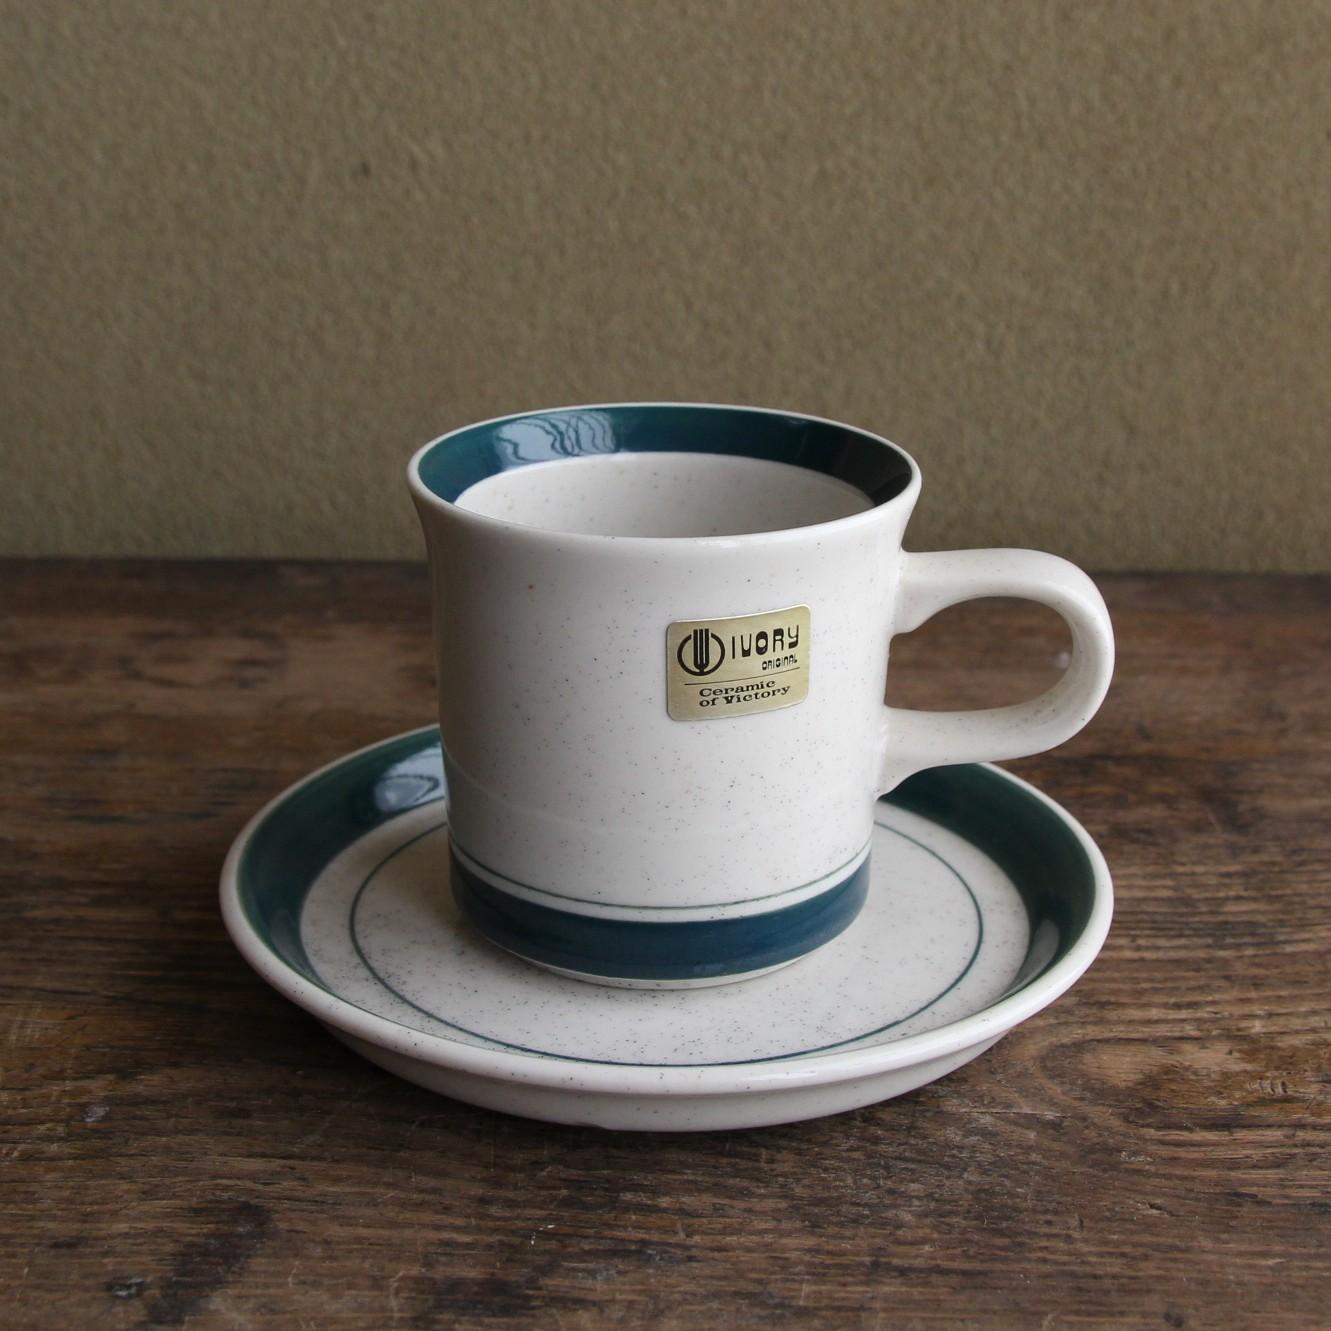 ivory ブルーグリーン ラインのカップ&ソーサー 在庫1客